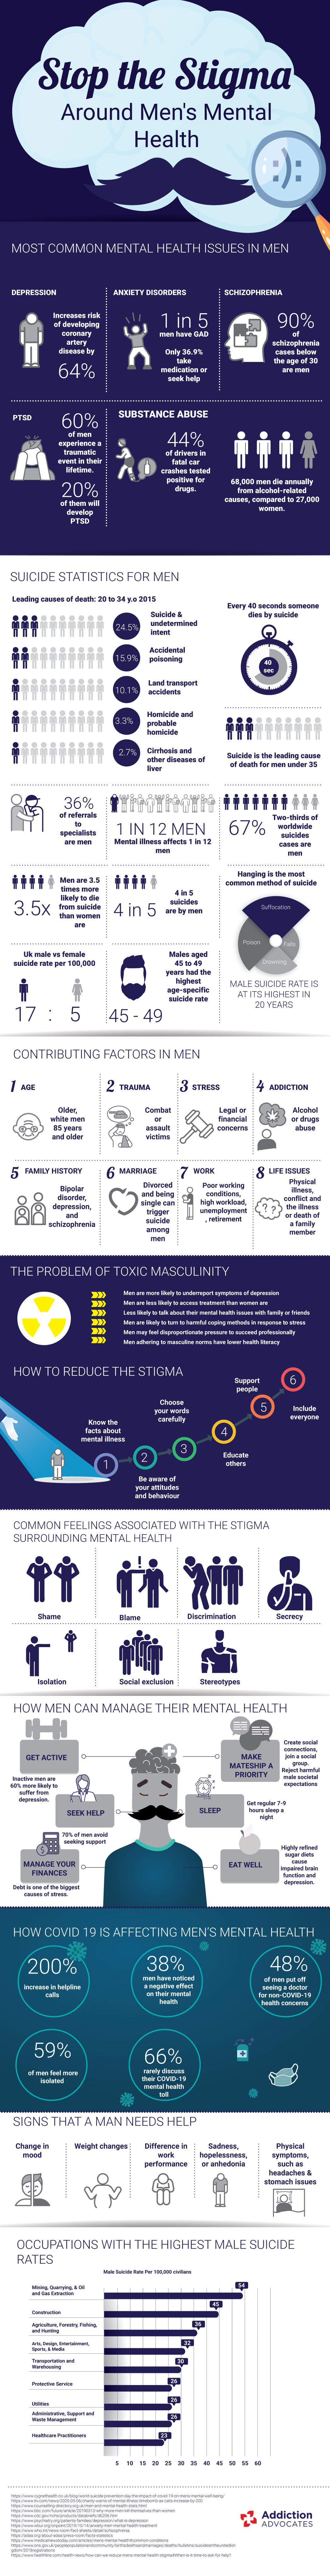 Stop the Stigma around Mens Mental Health